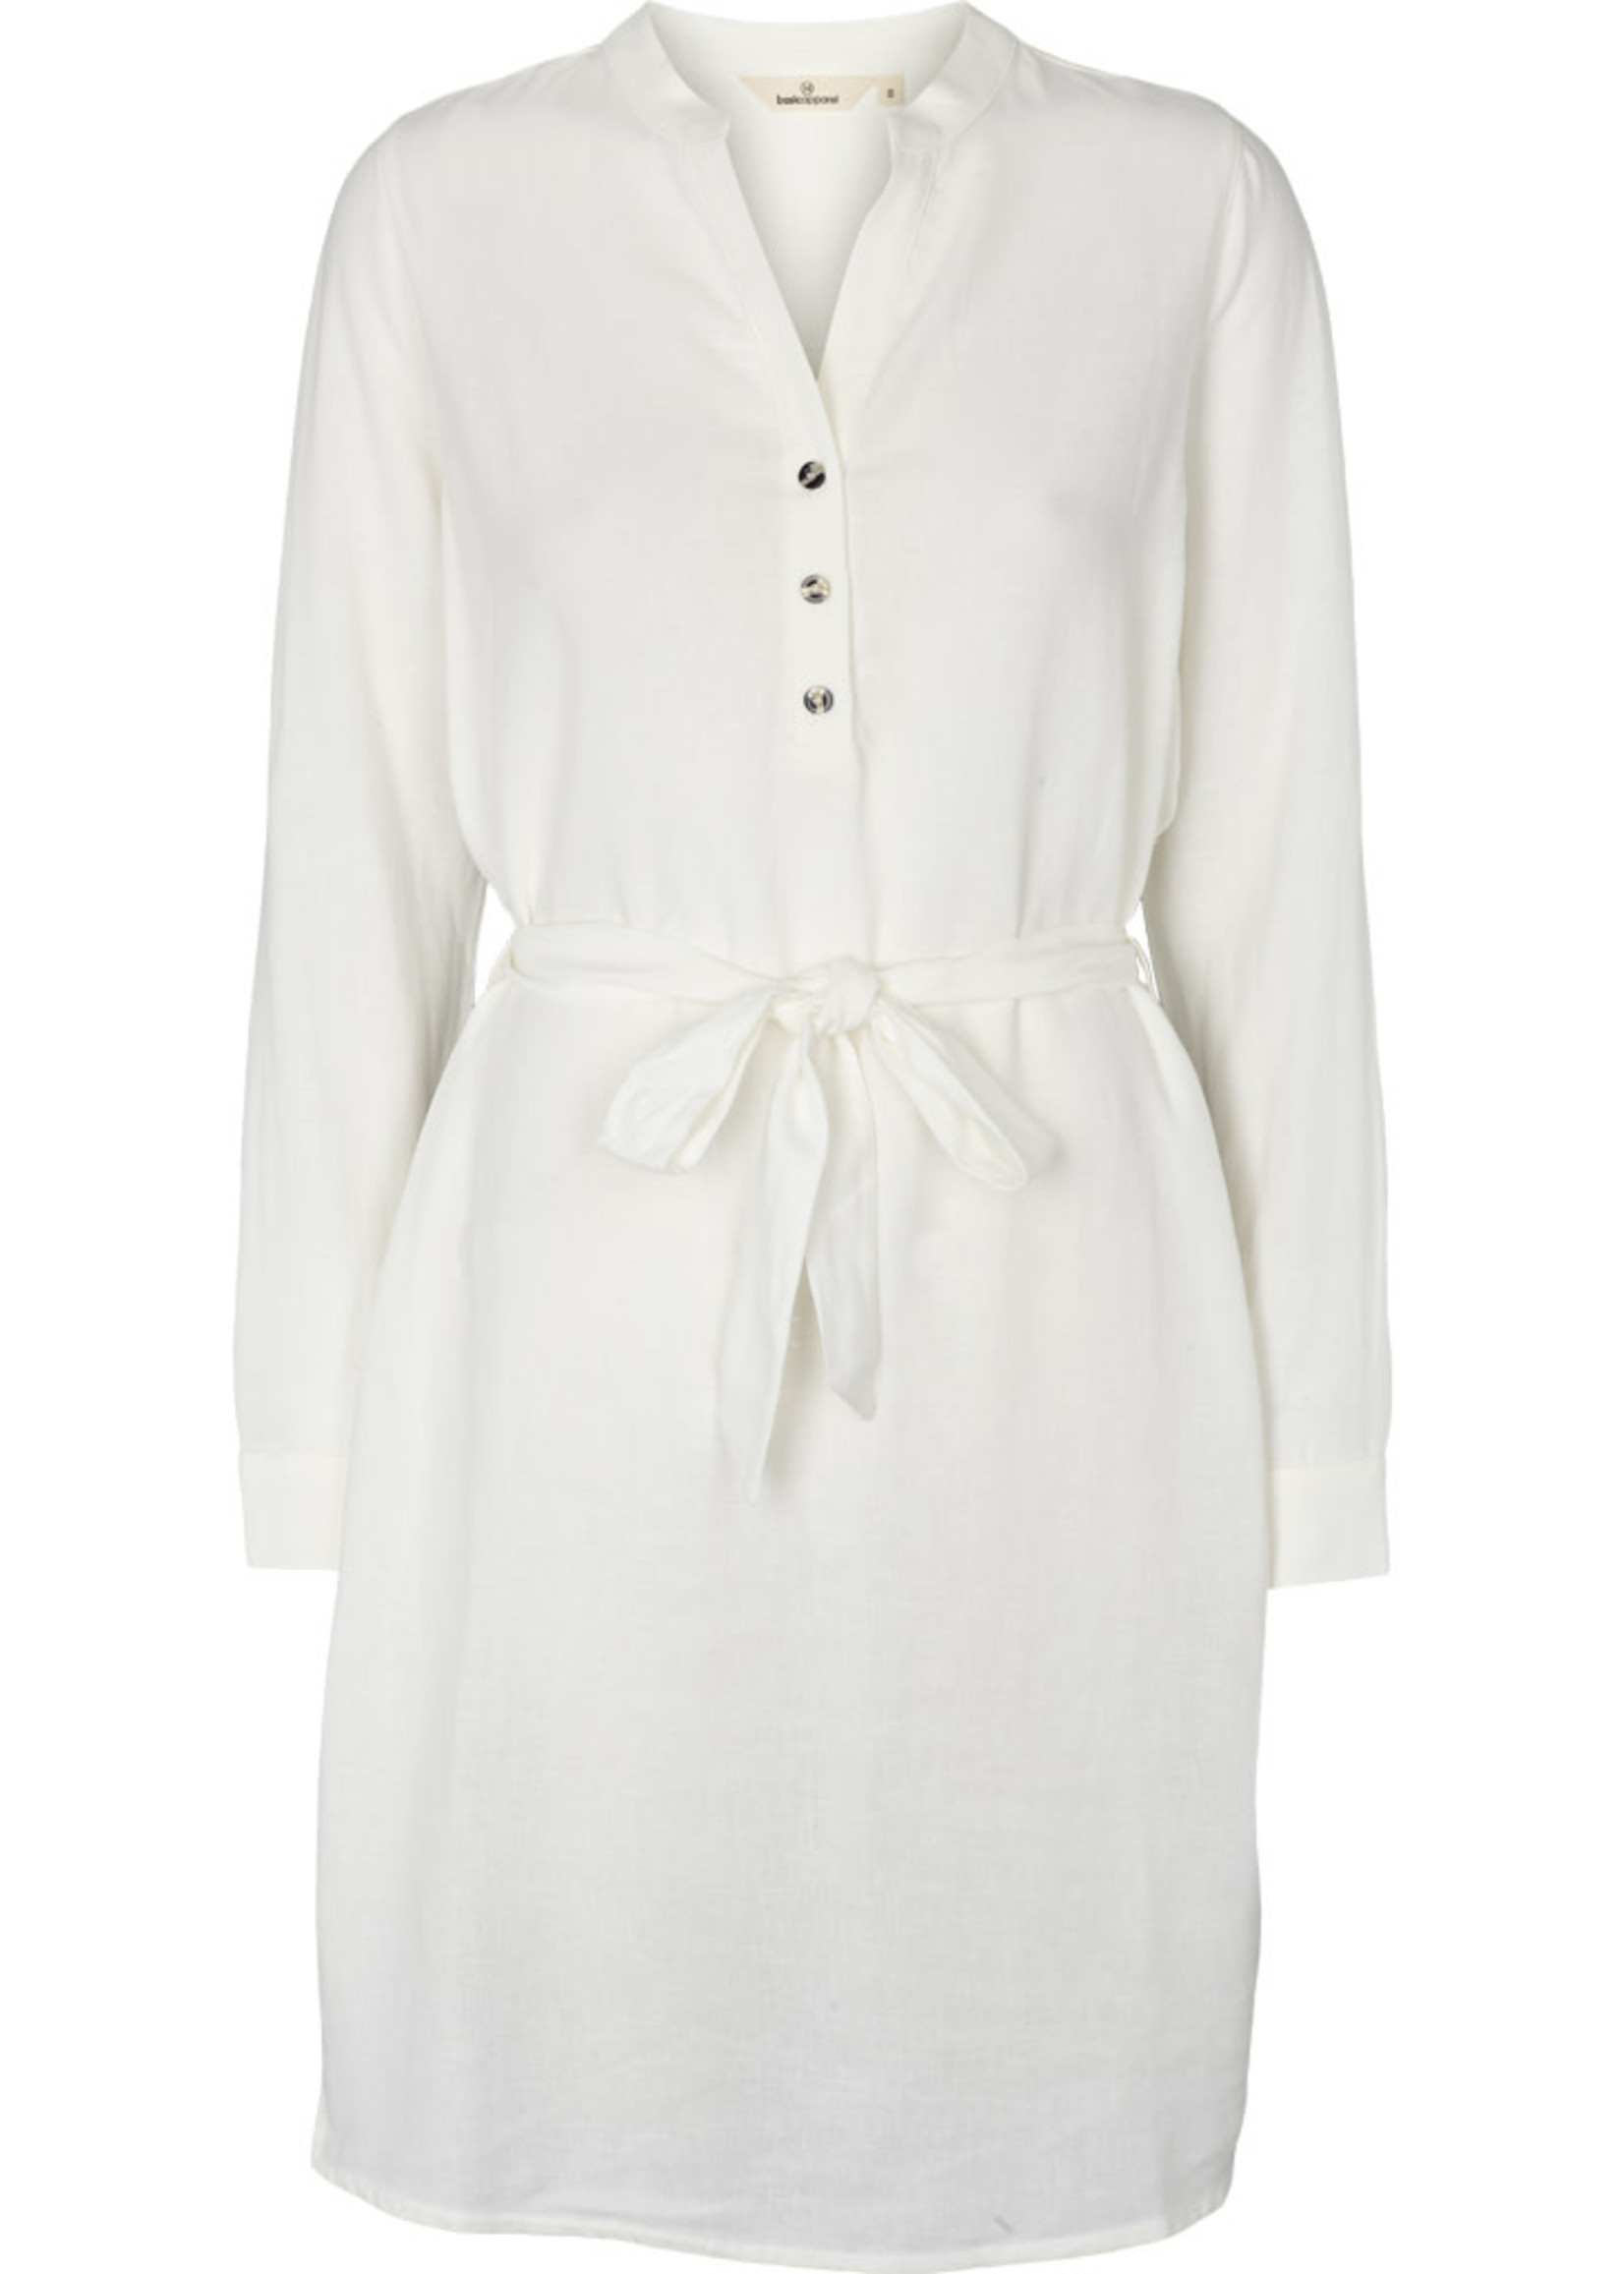 Basic Apparel Tove Dress